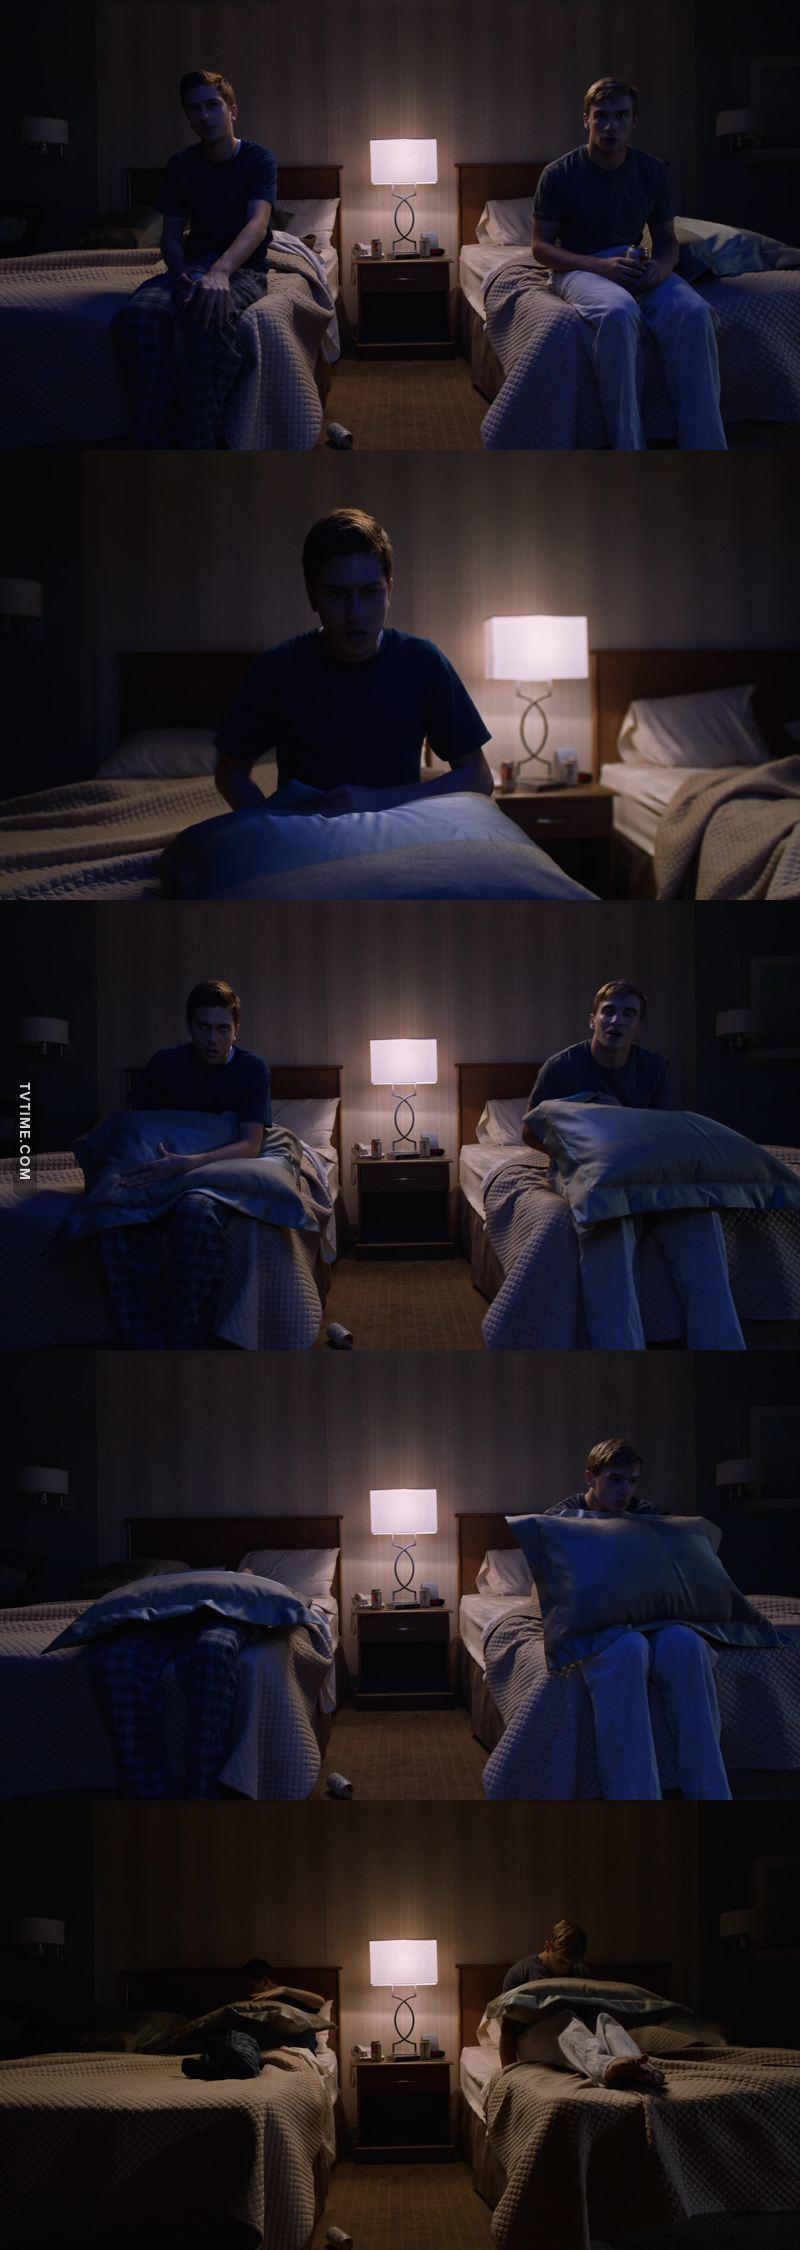 Weirdest scene ever